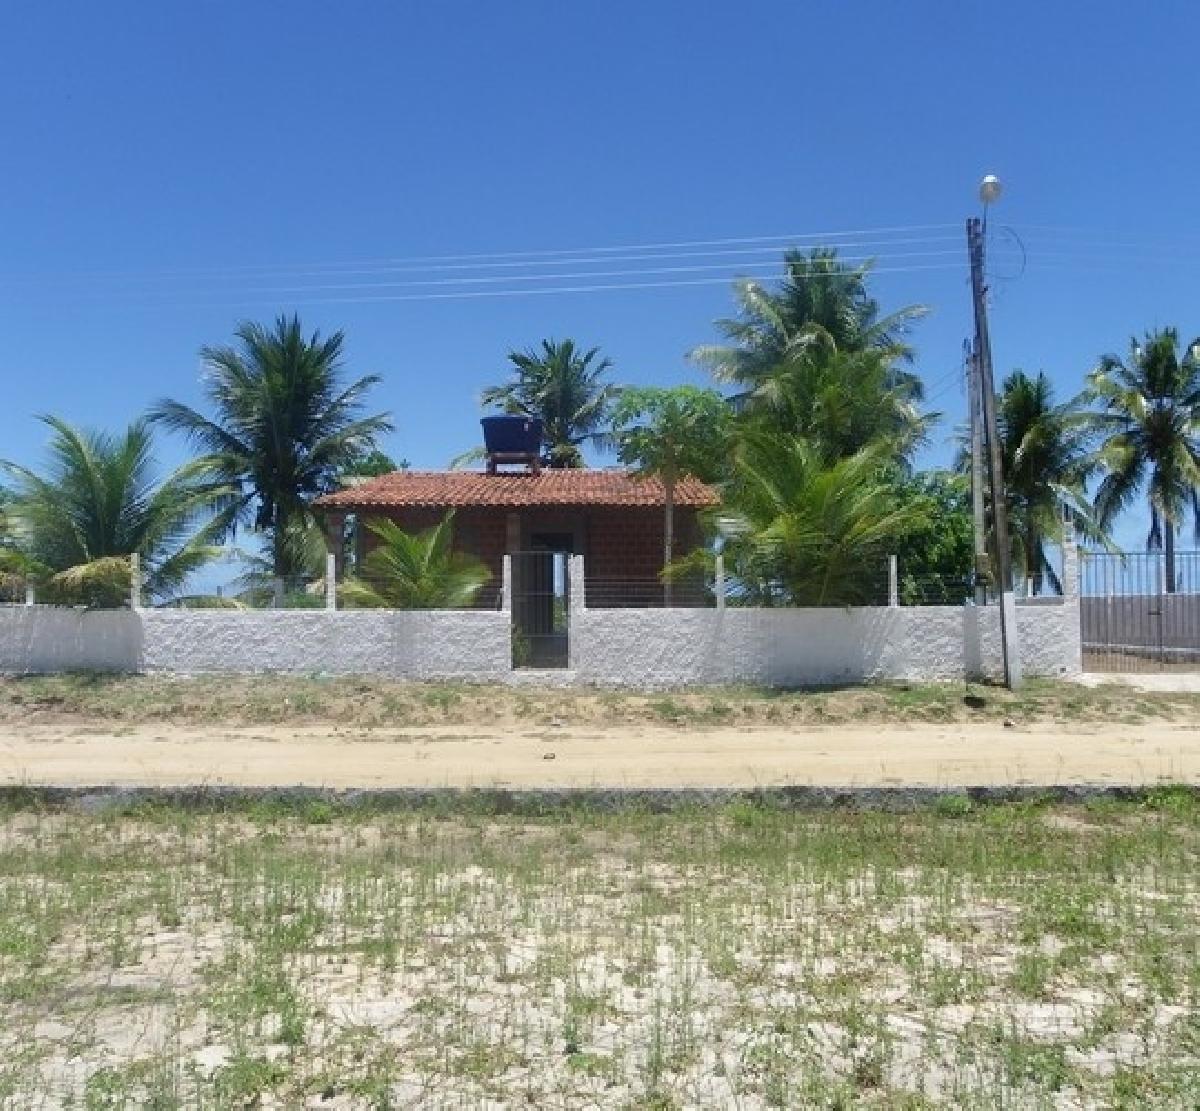 villa for sale itamarac pernambuco brazil cheap cheap